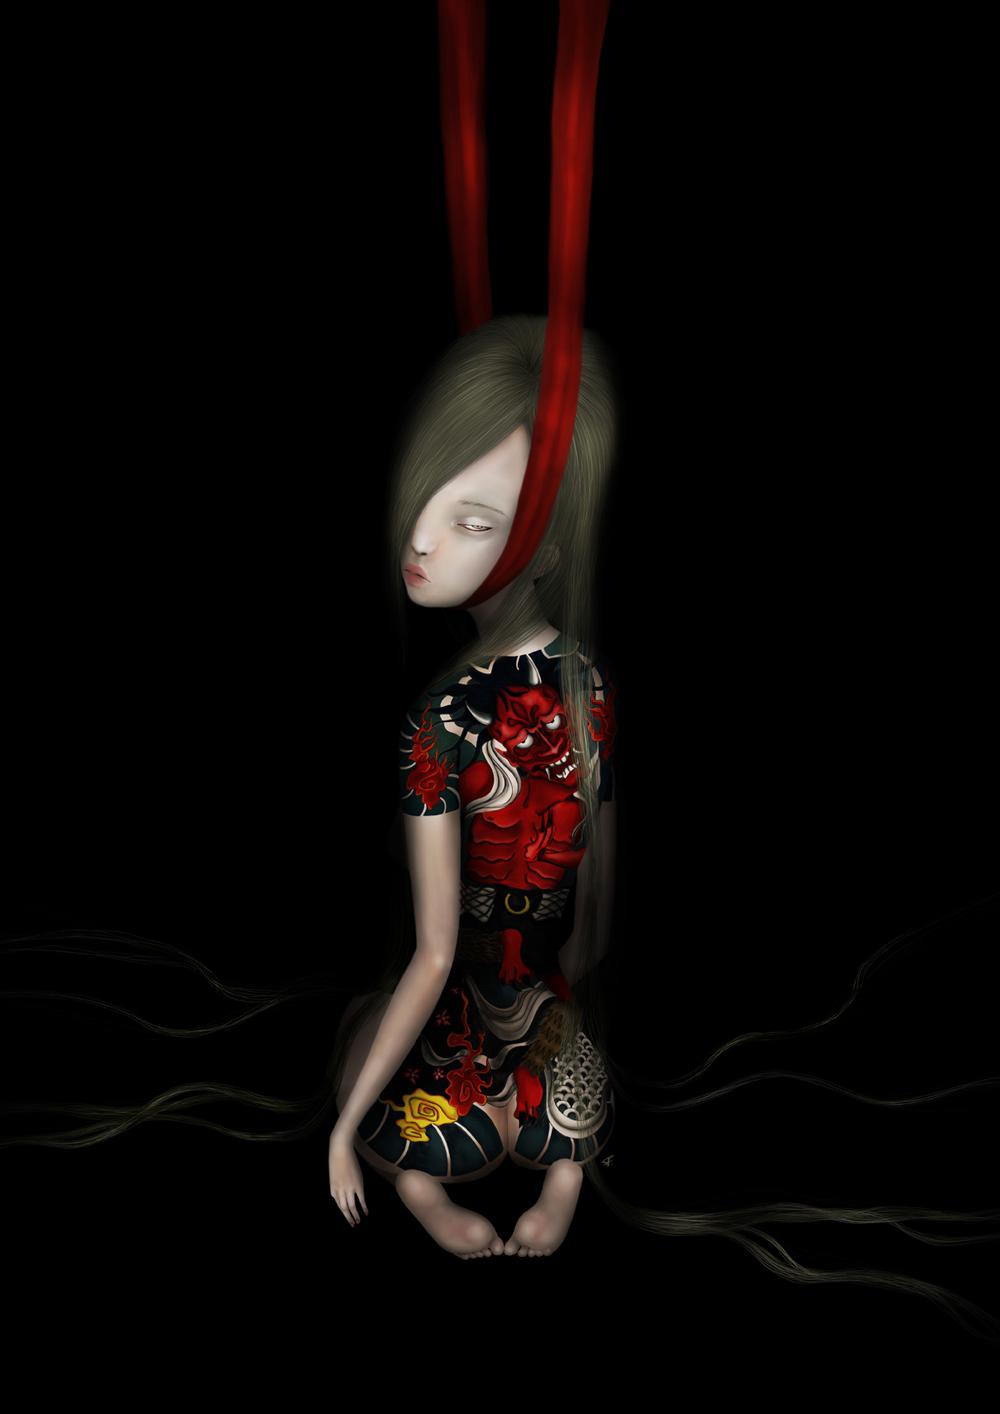 sonya fu - digital painting - beautiful bizarre art magazine interview